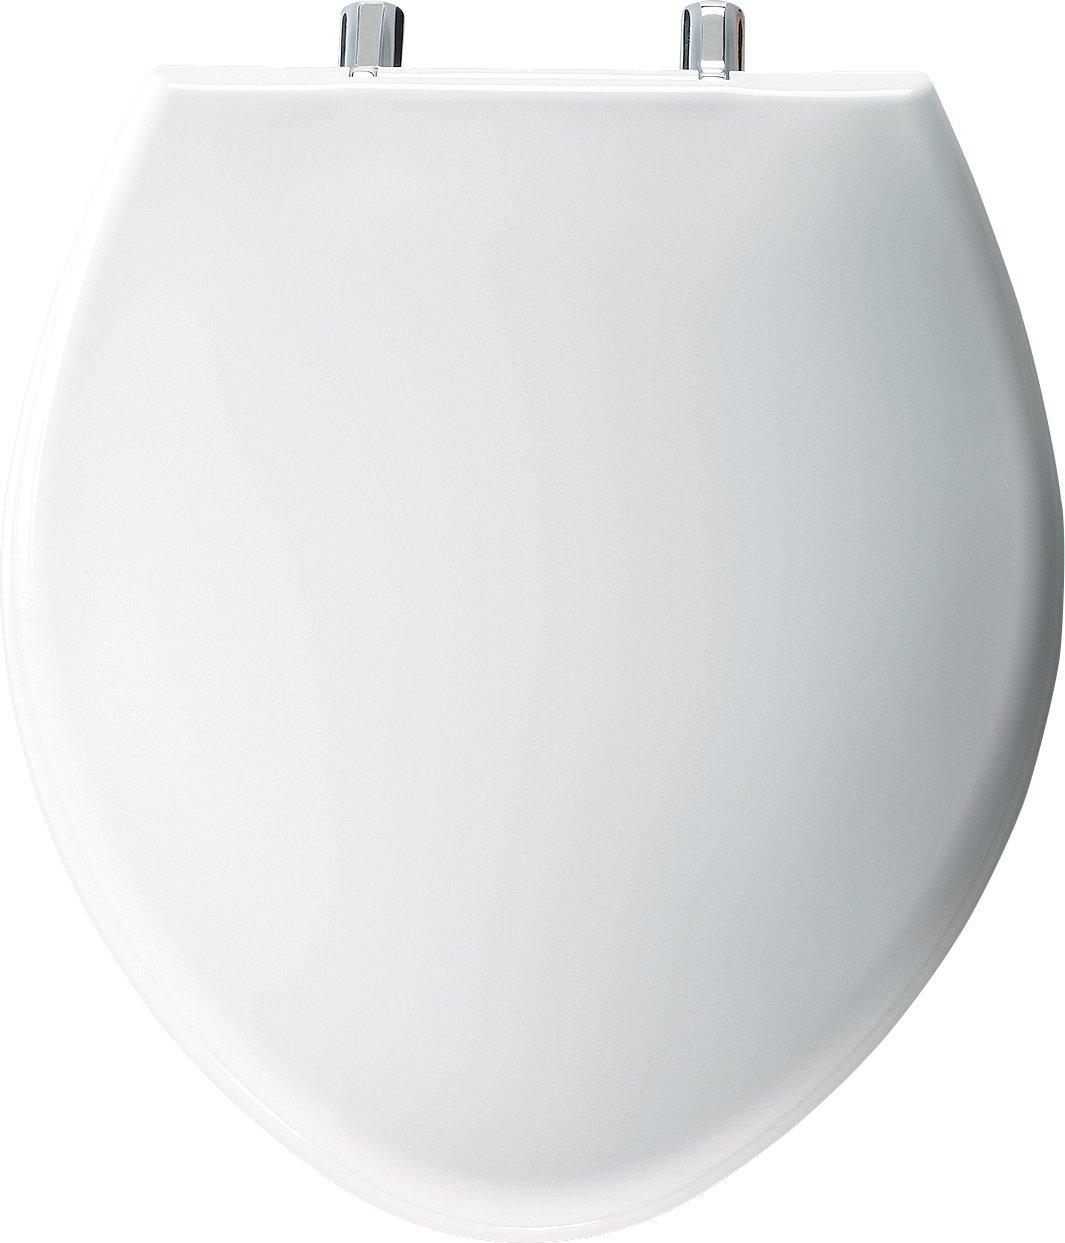 Bemis 1000CP000 1000CPT 000 Paramount Plastic Elongated Toilet Seat White by Bemis (Image #1)